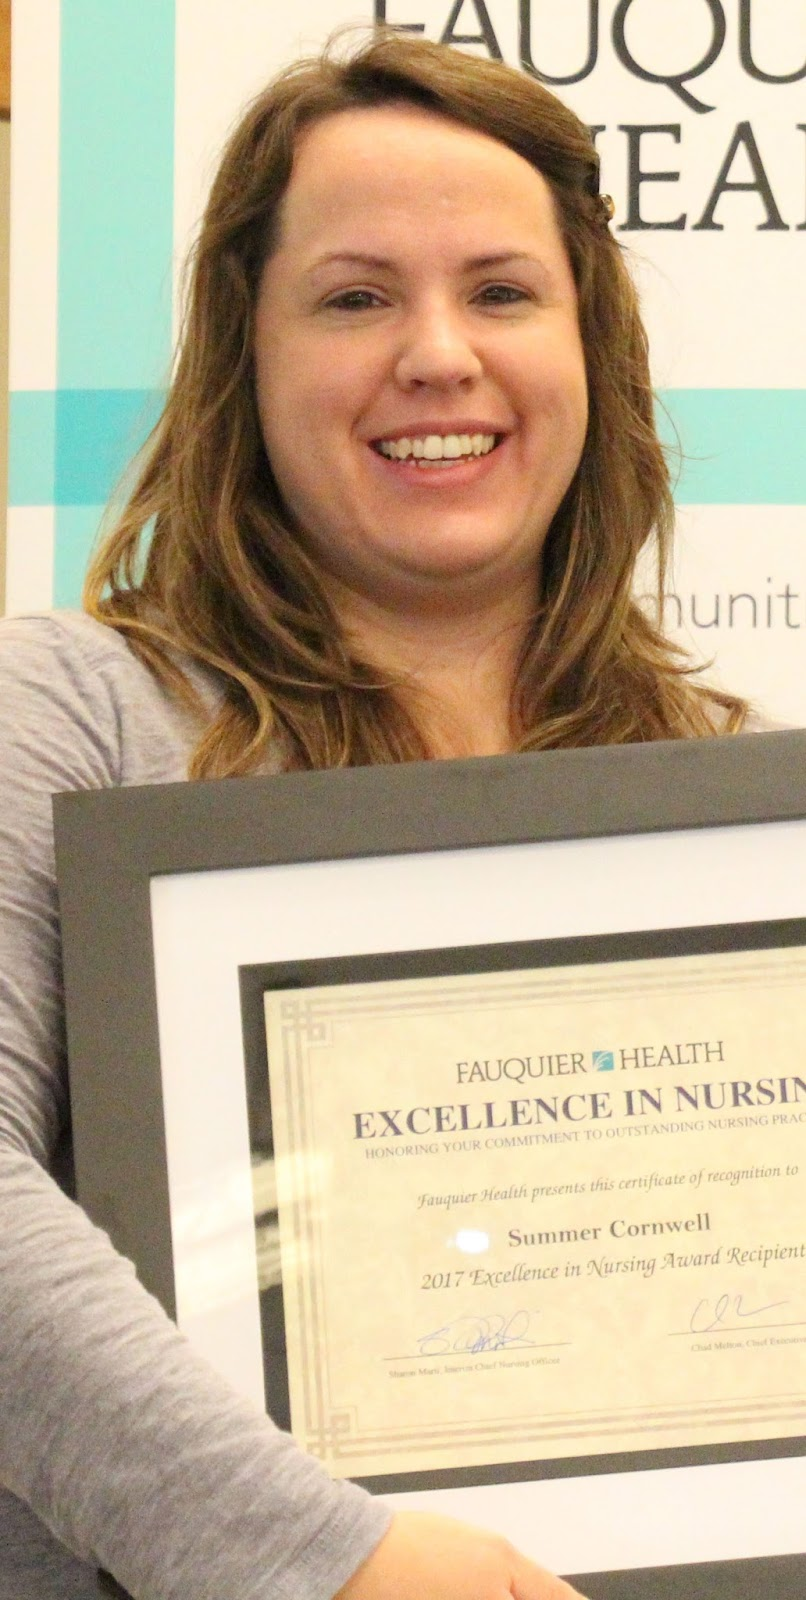 nursing excellence Pride in professional practice nursing excellence summer 2015 blueprint for exceptional nursing practice professional practice model 5 initiative enhances comfort.